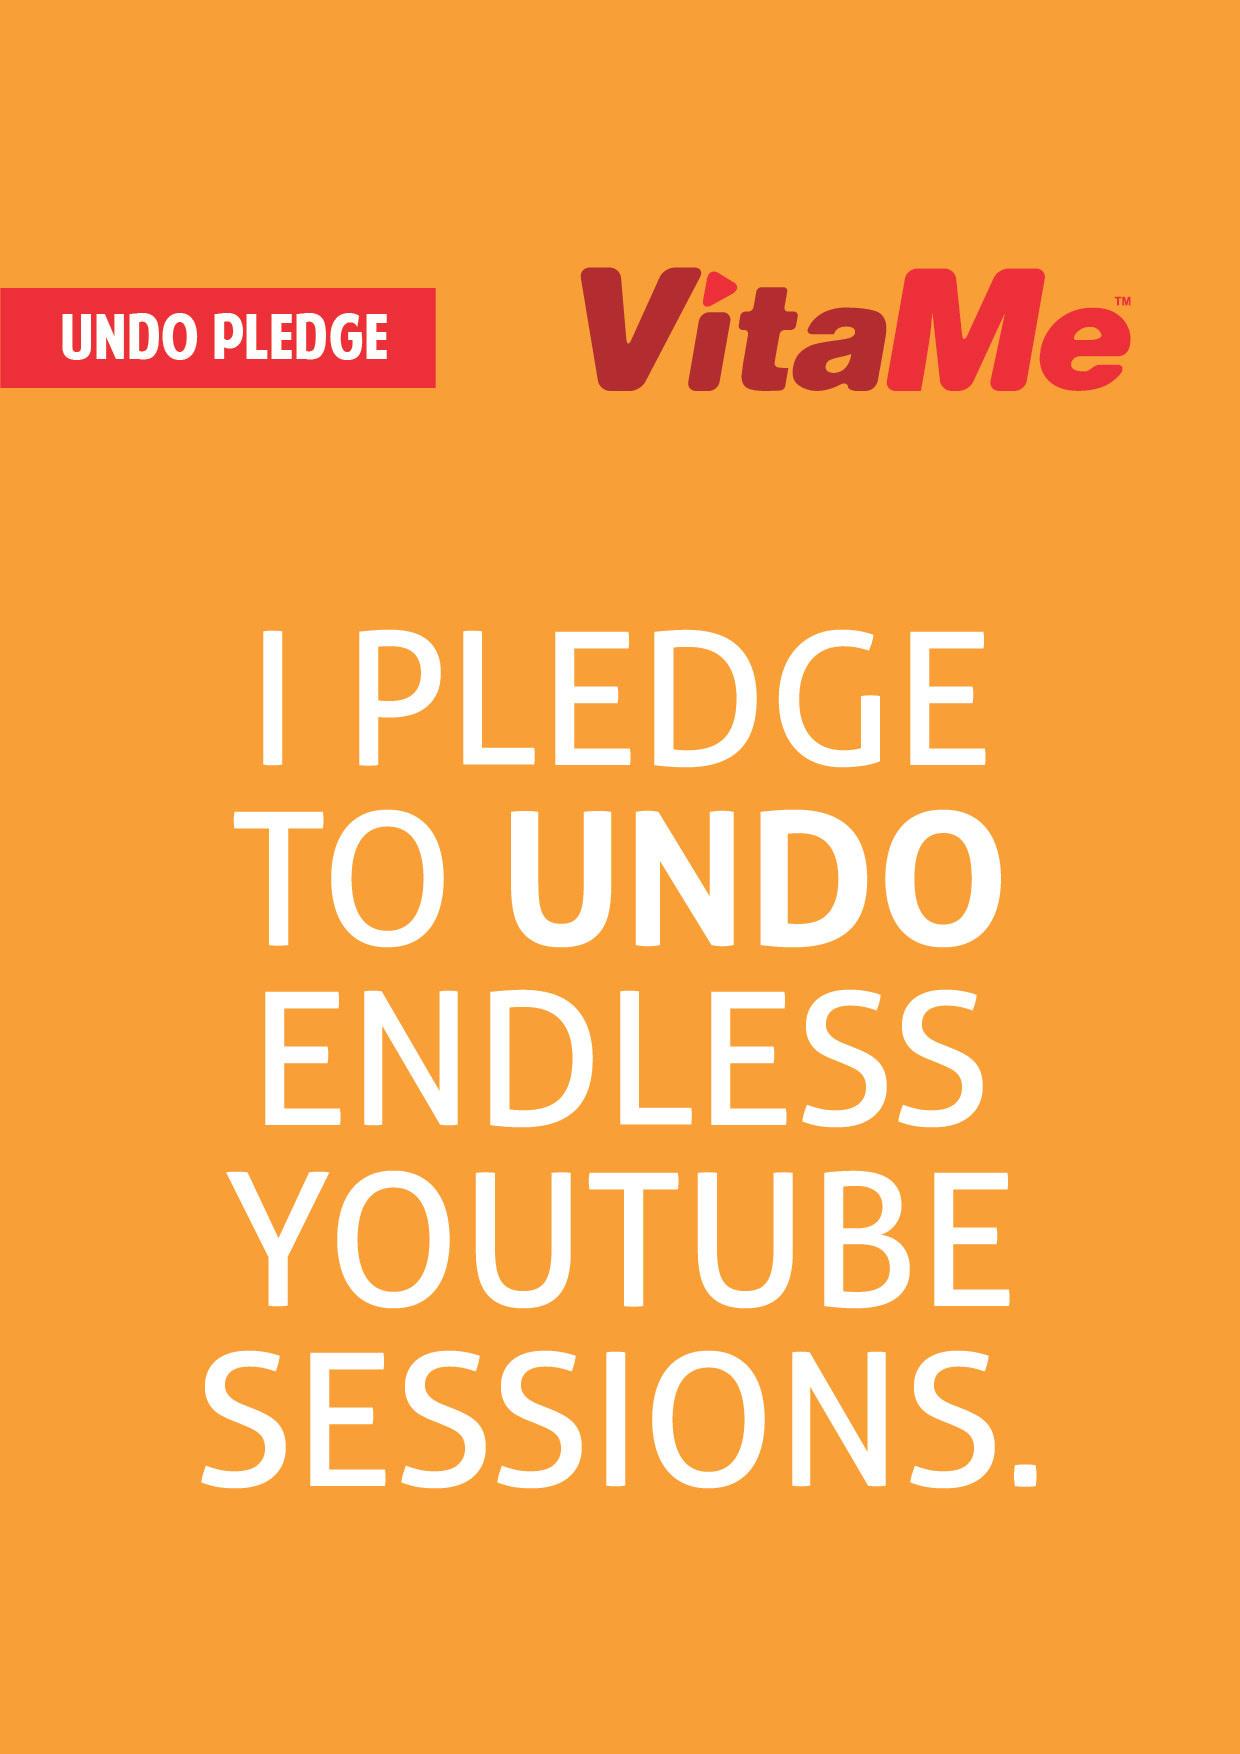 Pledge-Cues_A4-02